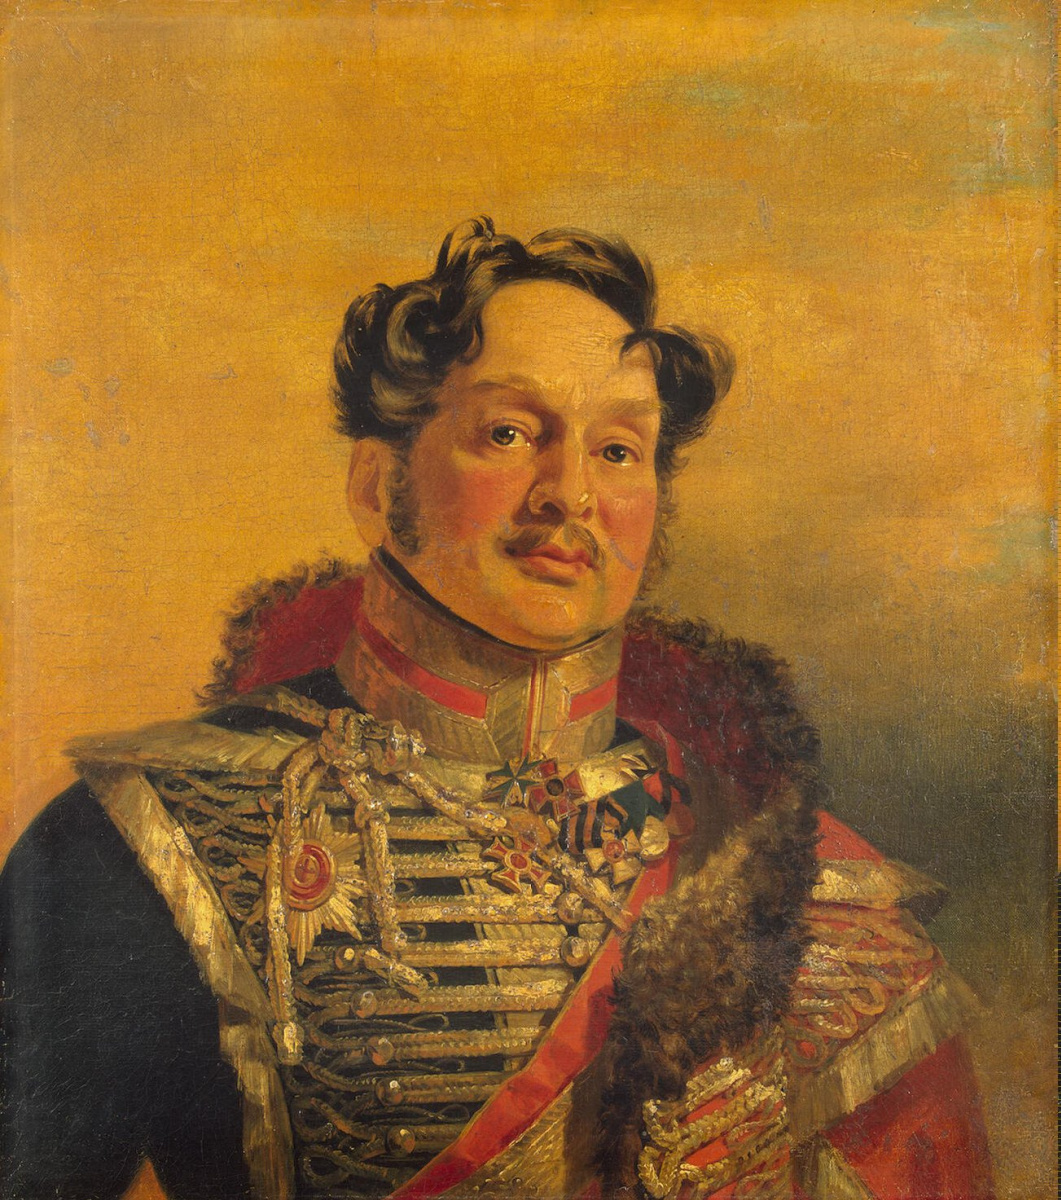 Джордж Доу. Портрет Михаила Ивановича Мезенцева